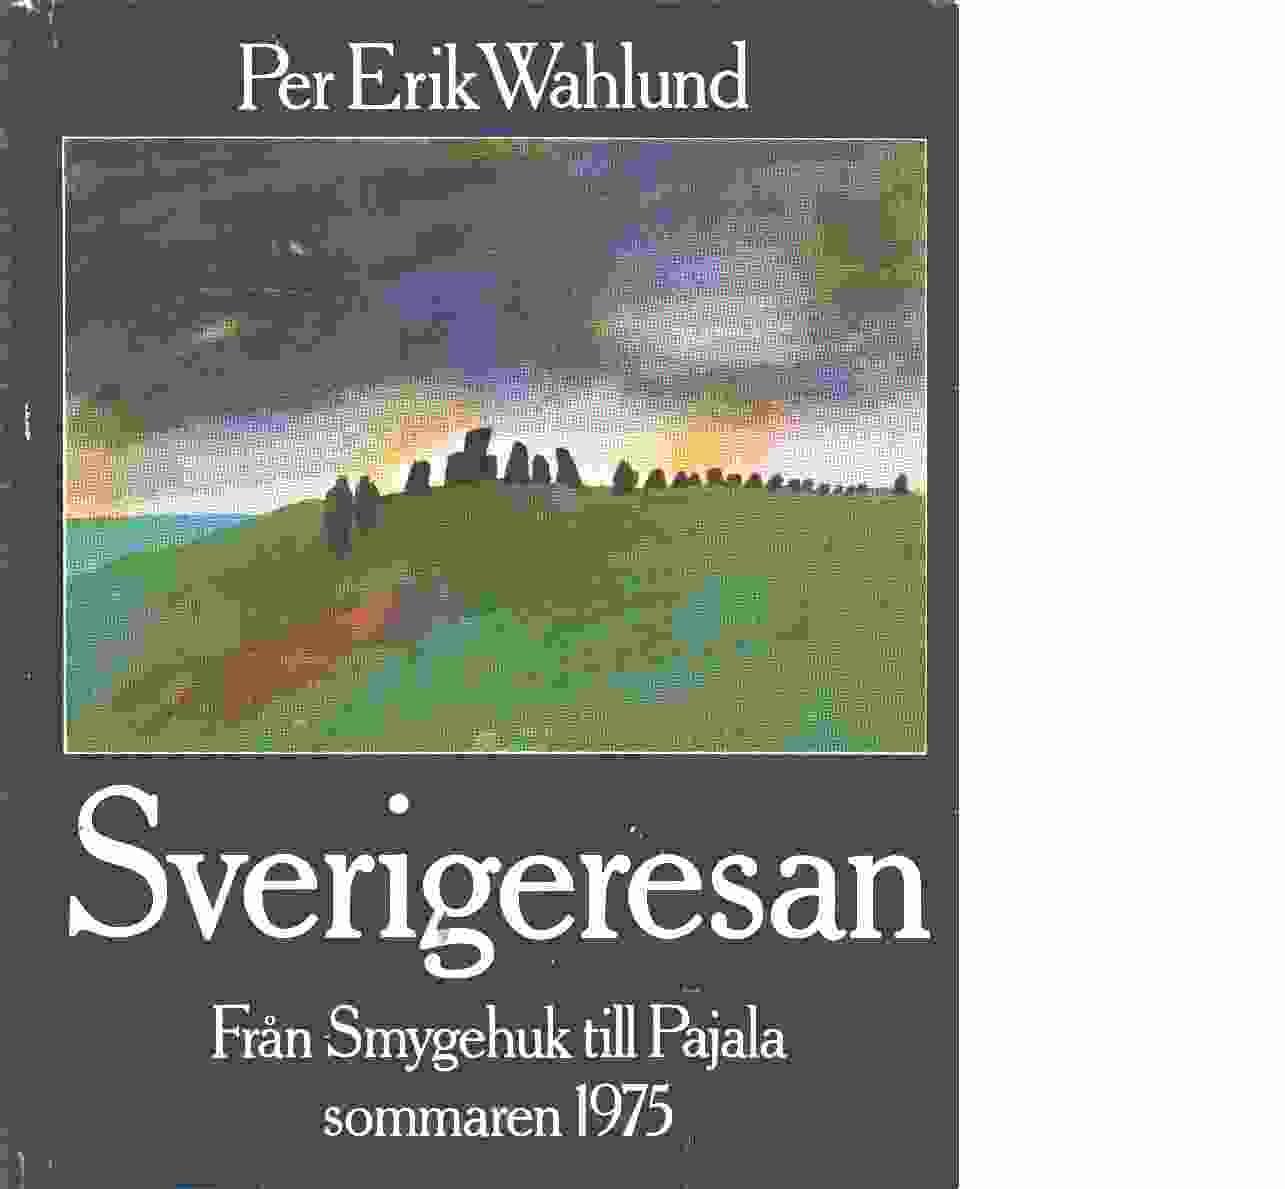 Sverigeresan - Wahlund, Per Erik